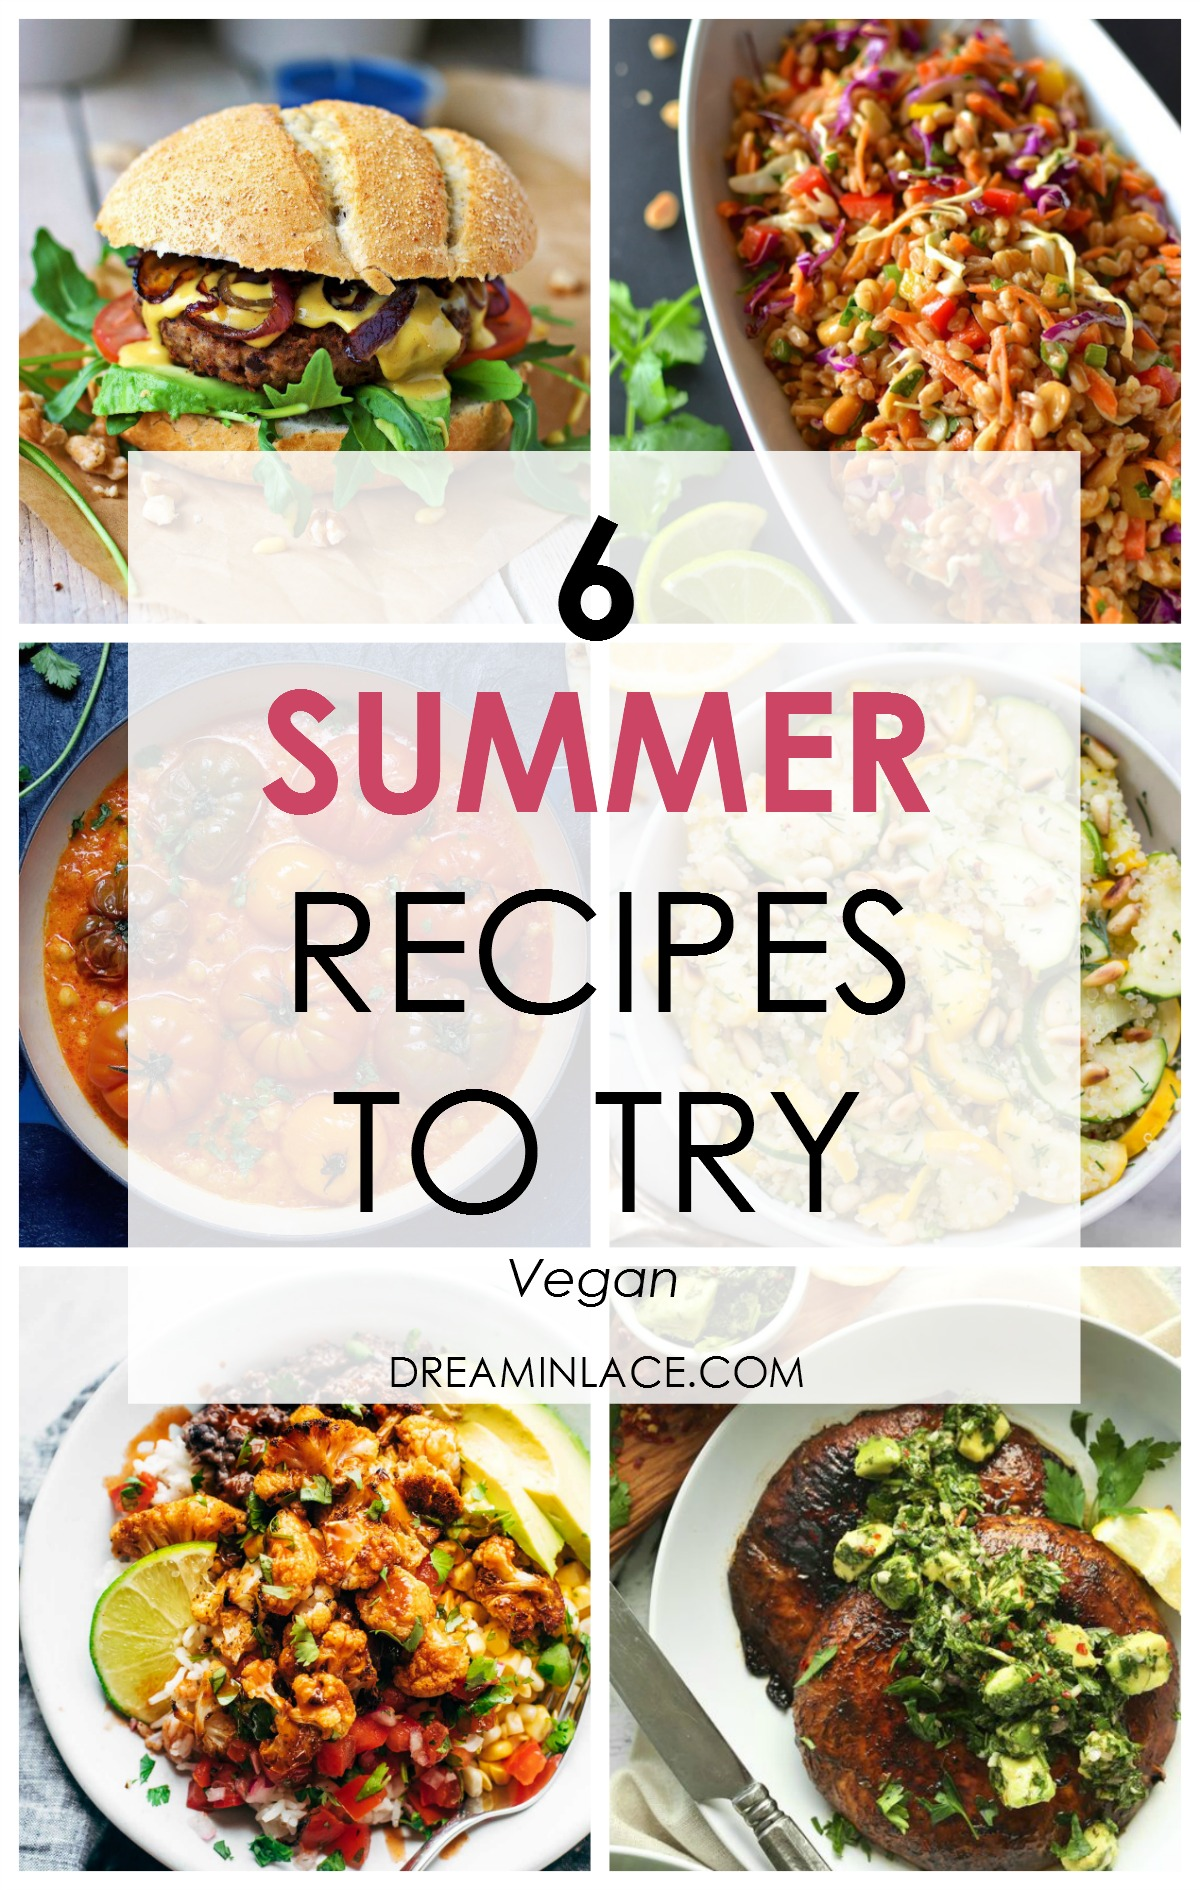 6 Vegan Summer Recipes to Try I DreaminLace.com #Vegan #SummerRecipes